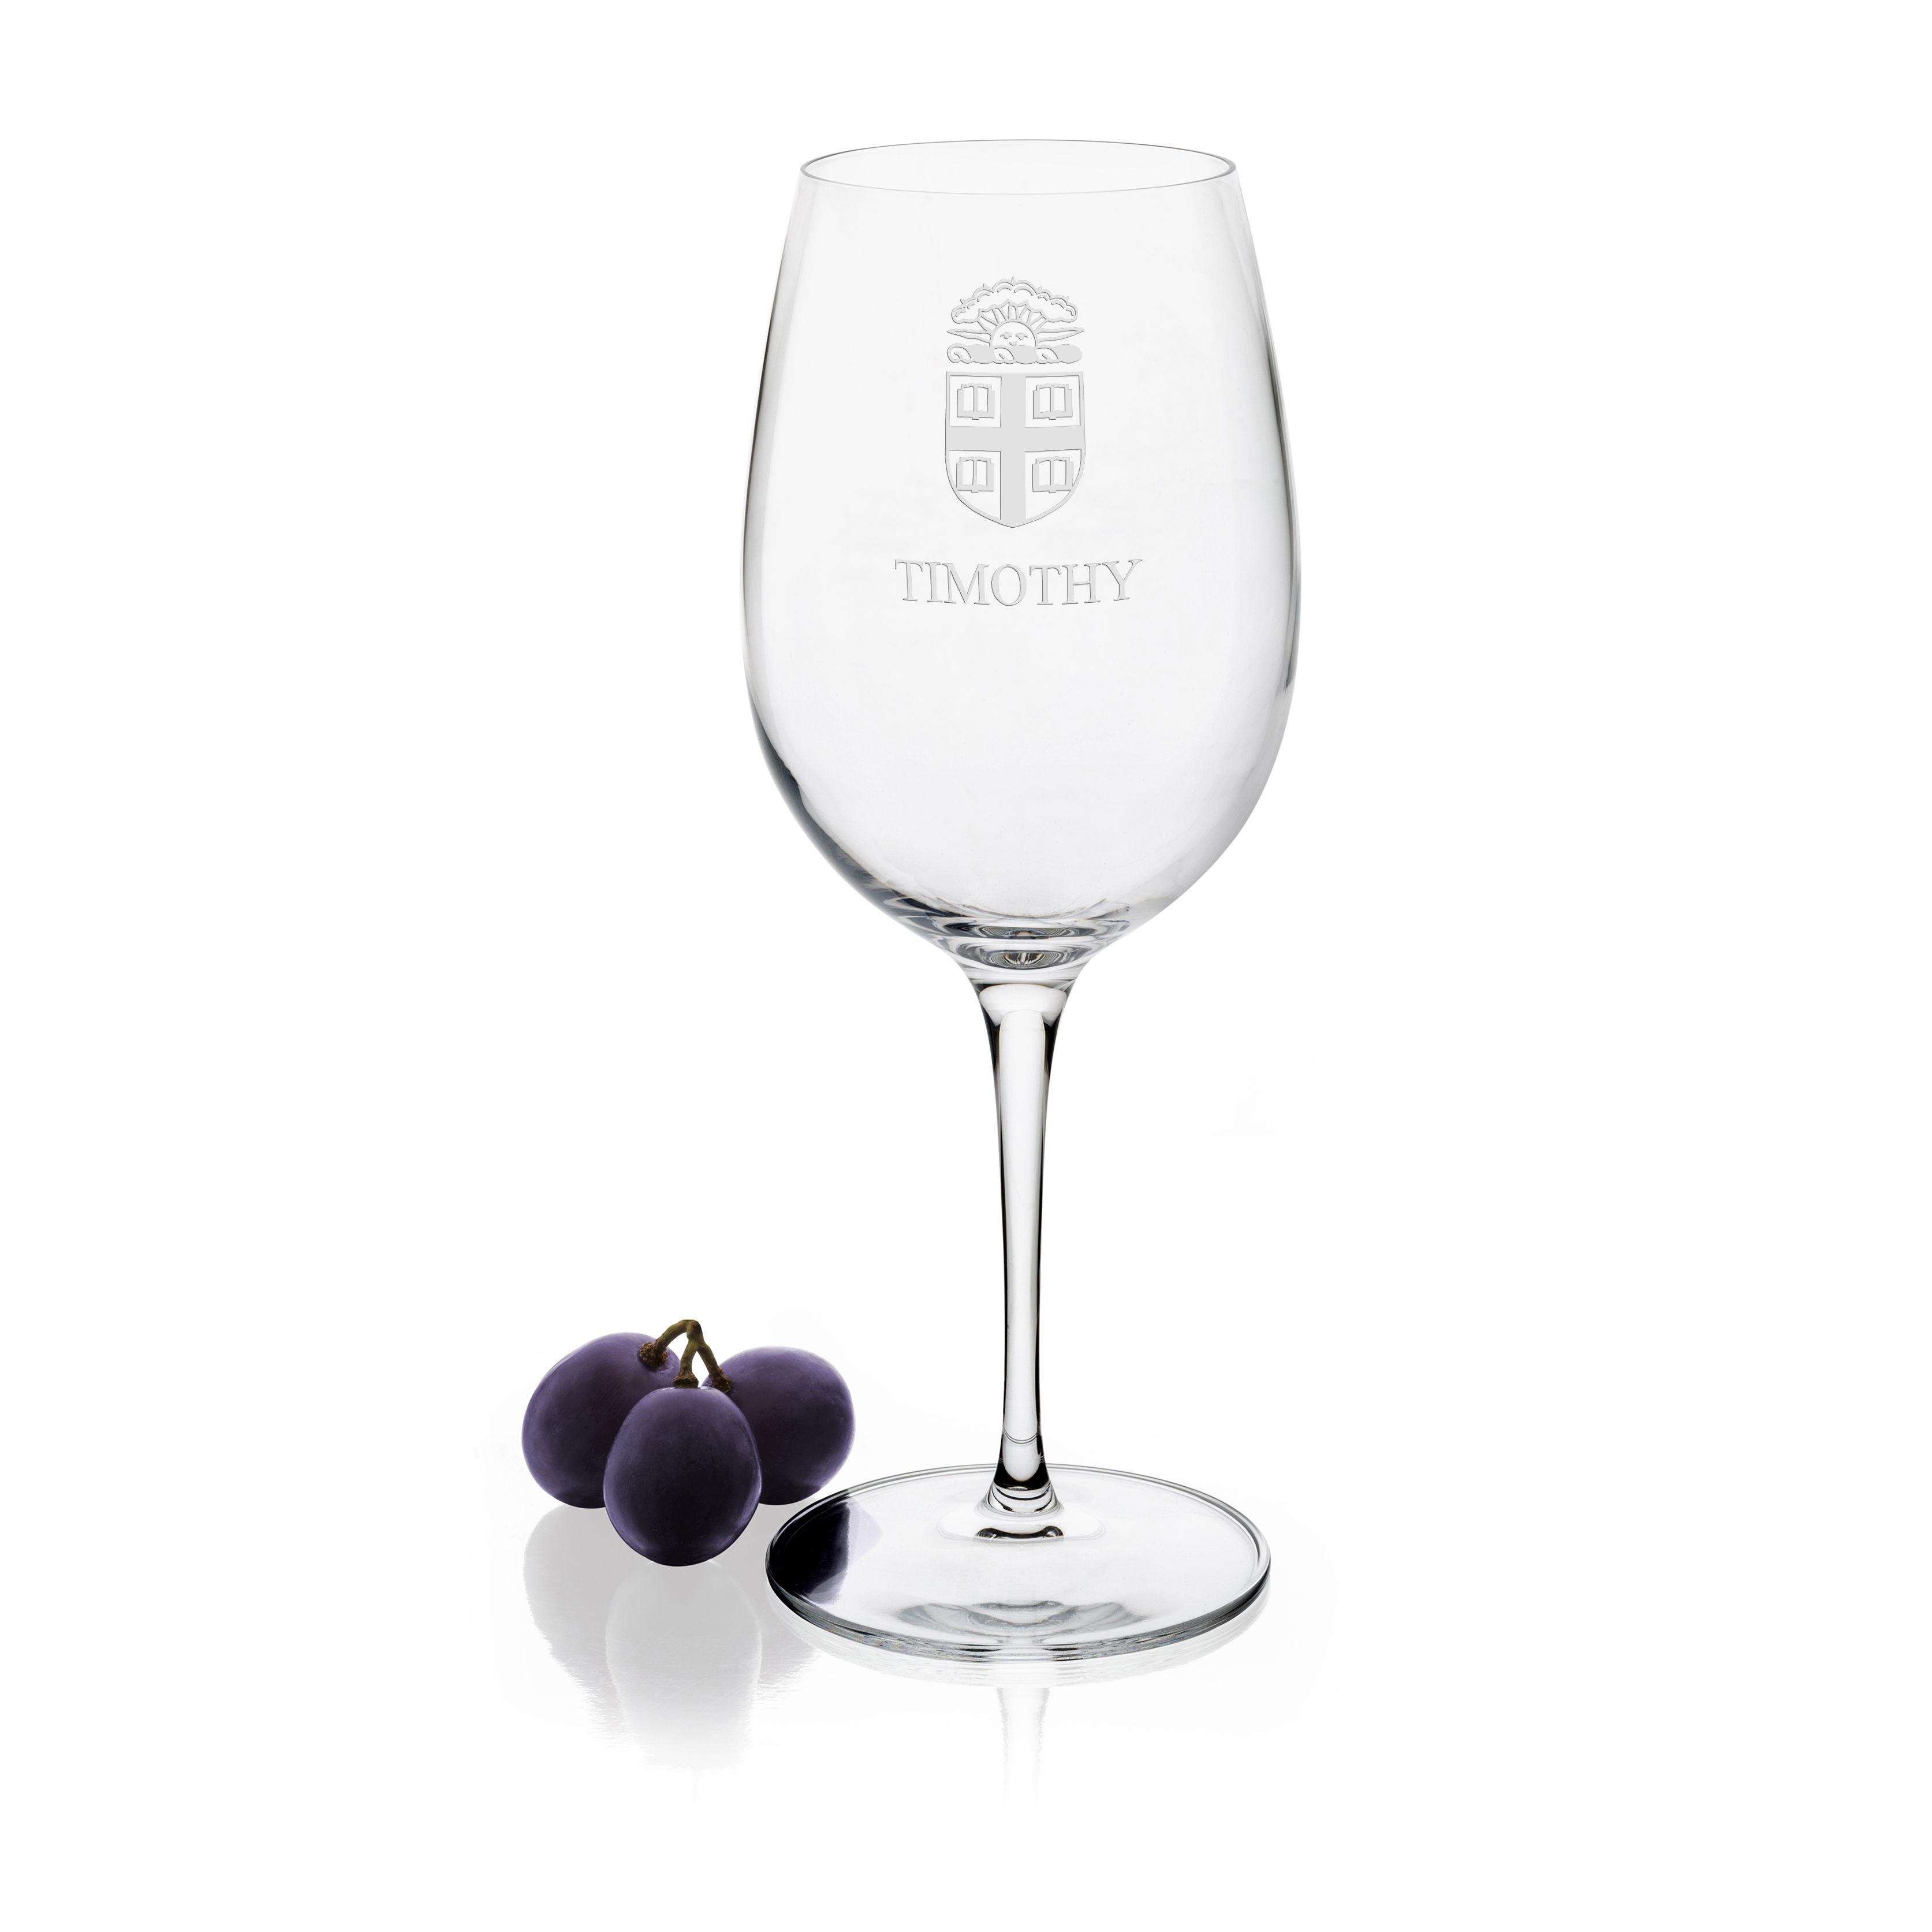 Brown University Red Wine Glasses - Set of 4